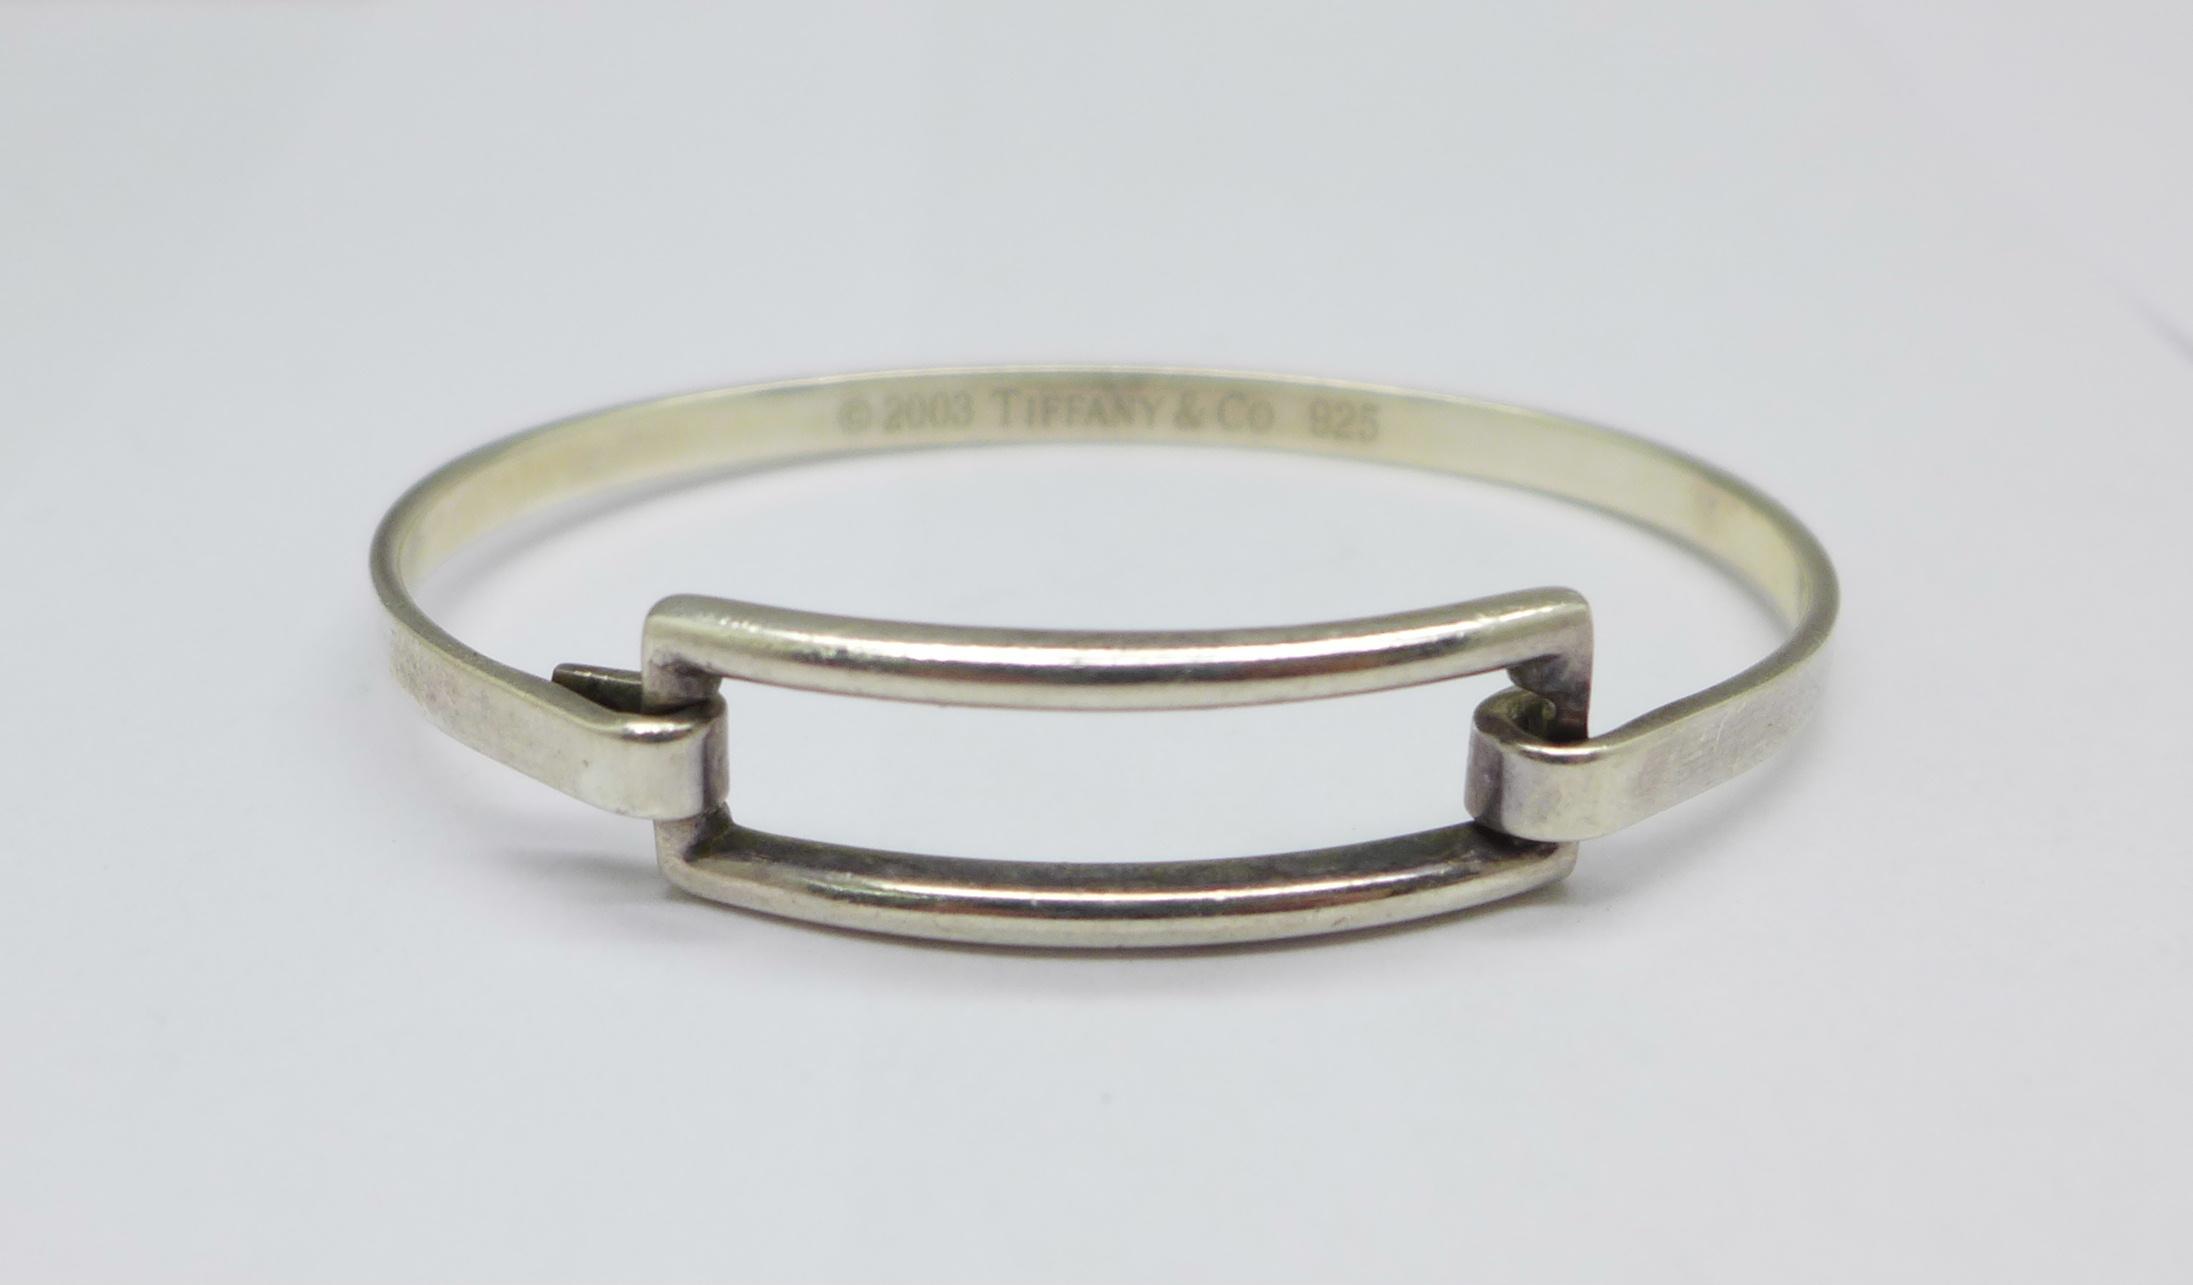 A silver Tiffany bangle, 15g